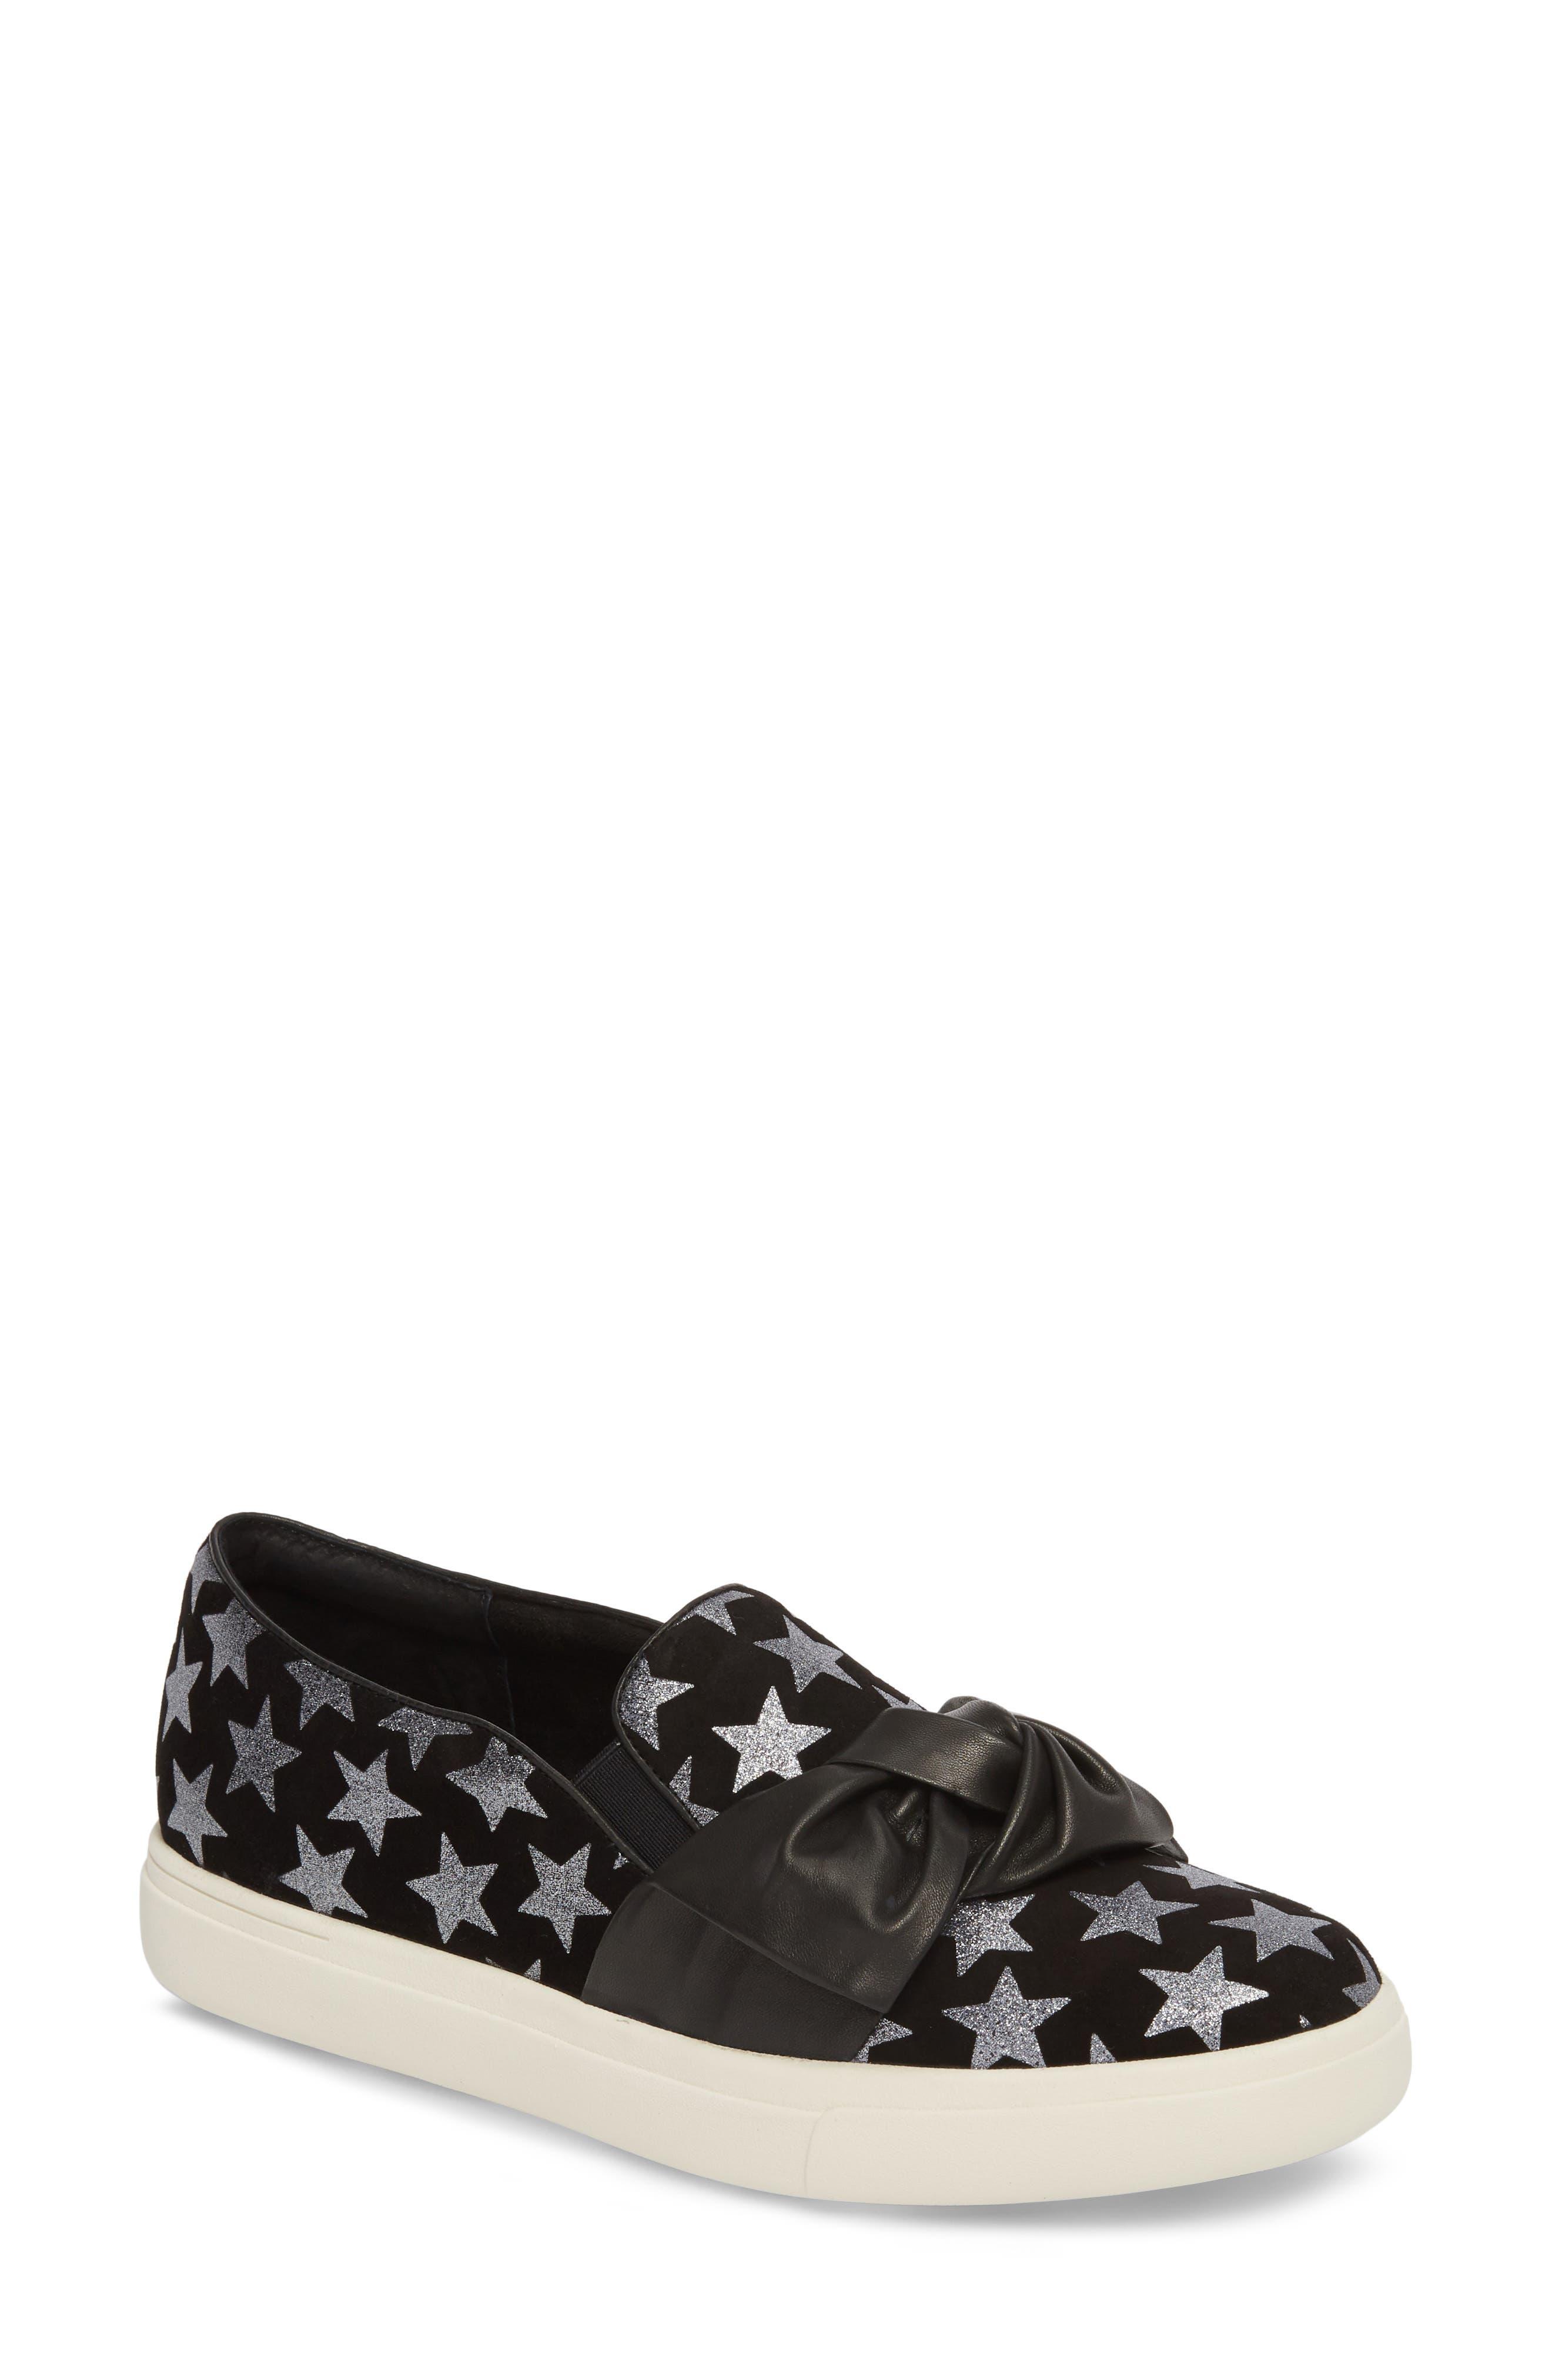 Odelet Slip-On Sneaker,                             Main thumbnail 1, color,                             BLACK/ PEWTER SUEDE